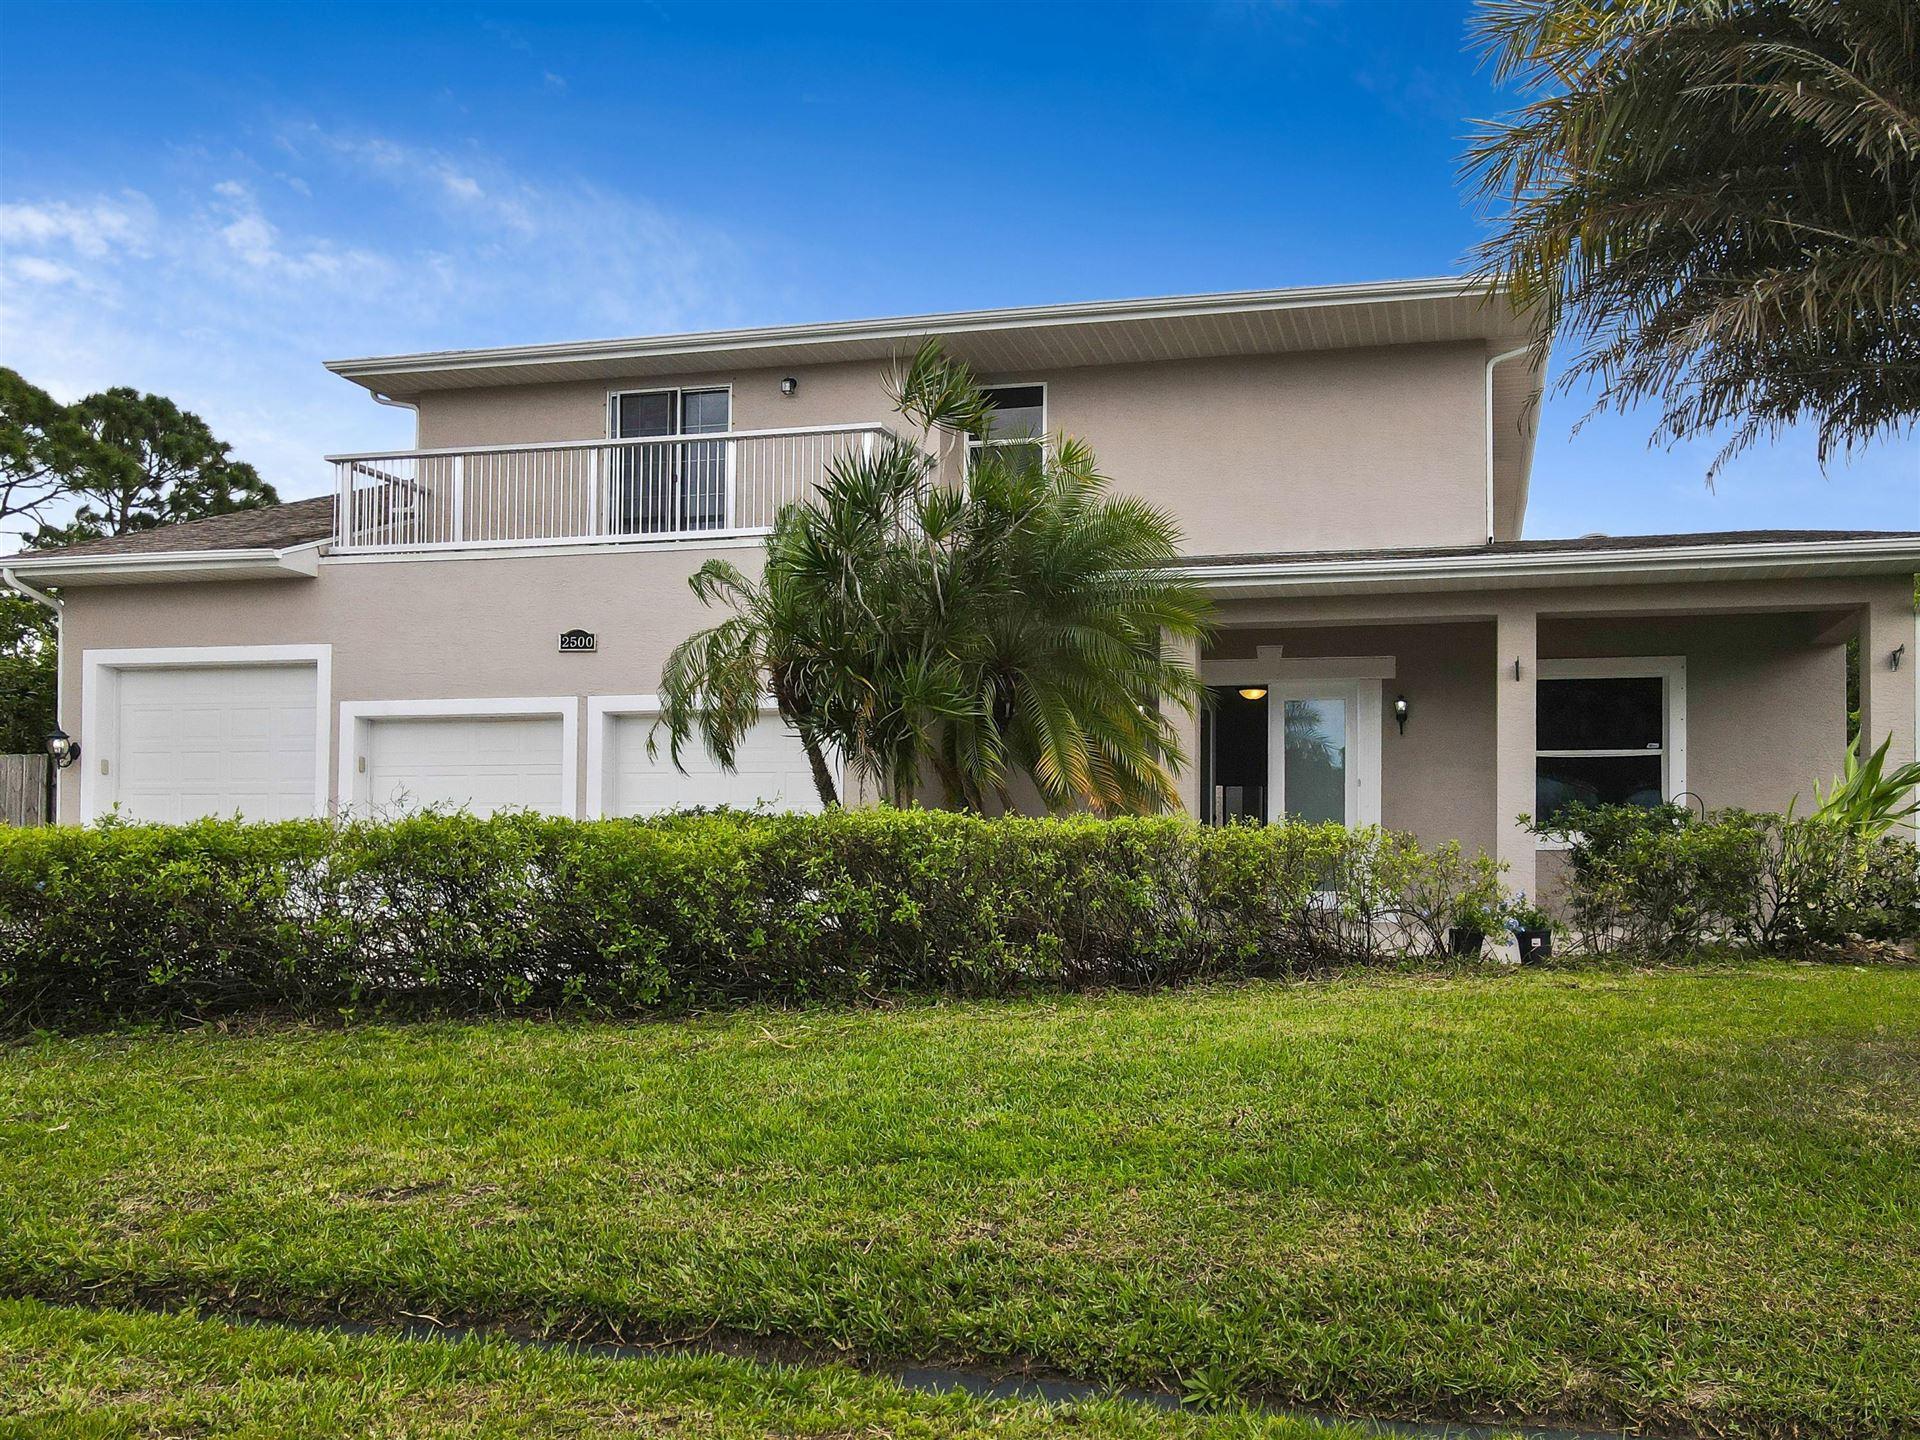 2500 SE Sapelo Avenue, Port Saint Lucie, FL 34952 - #: RX-10698445